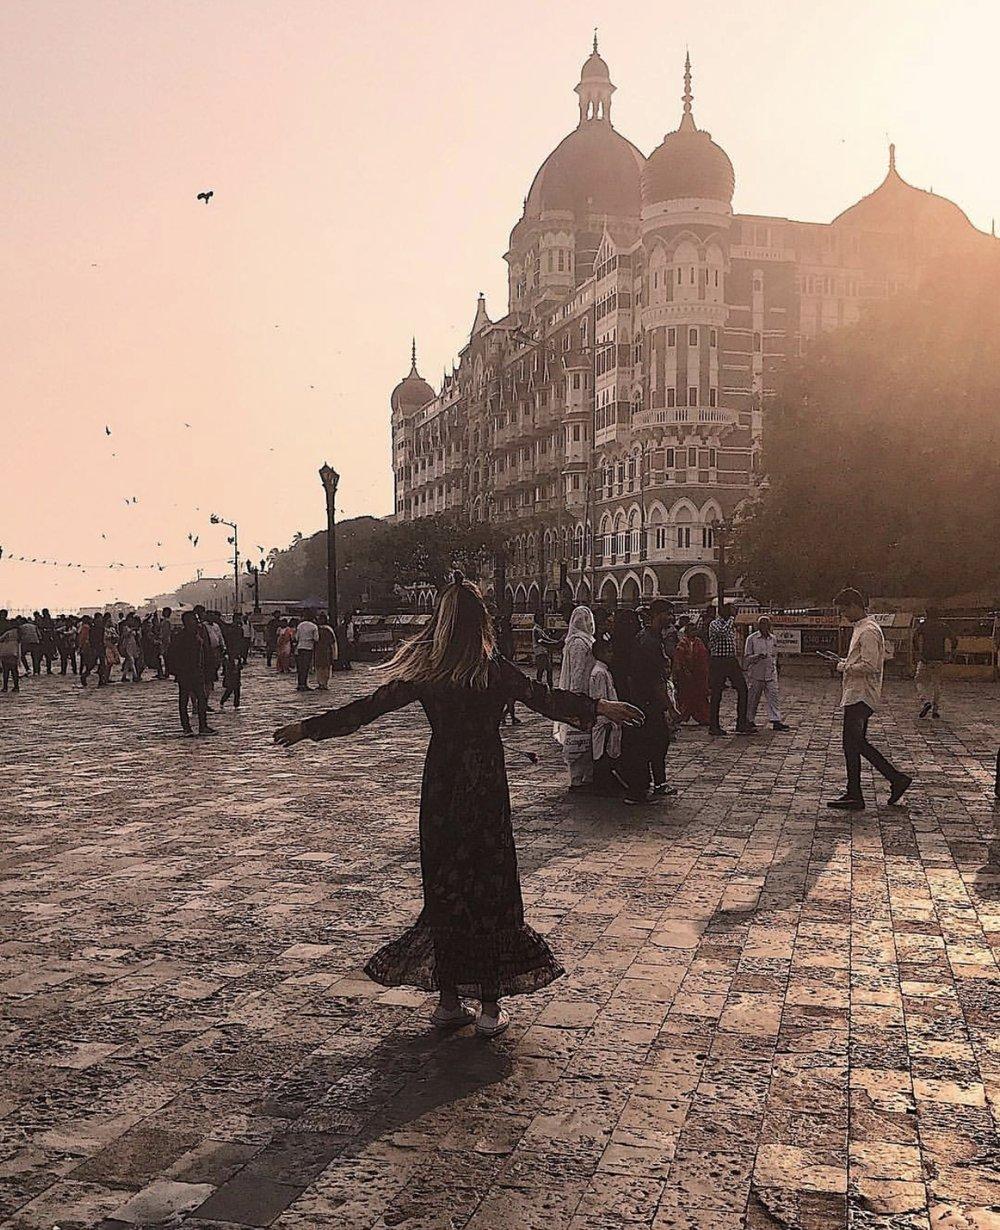 Beautiful sunset in front of Taj Mahal Palace